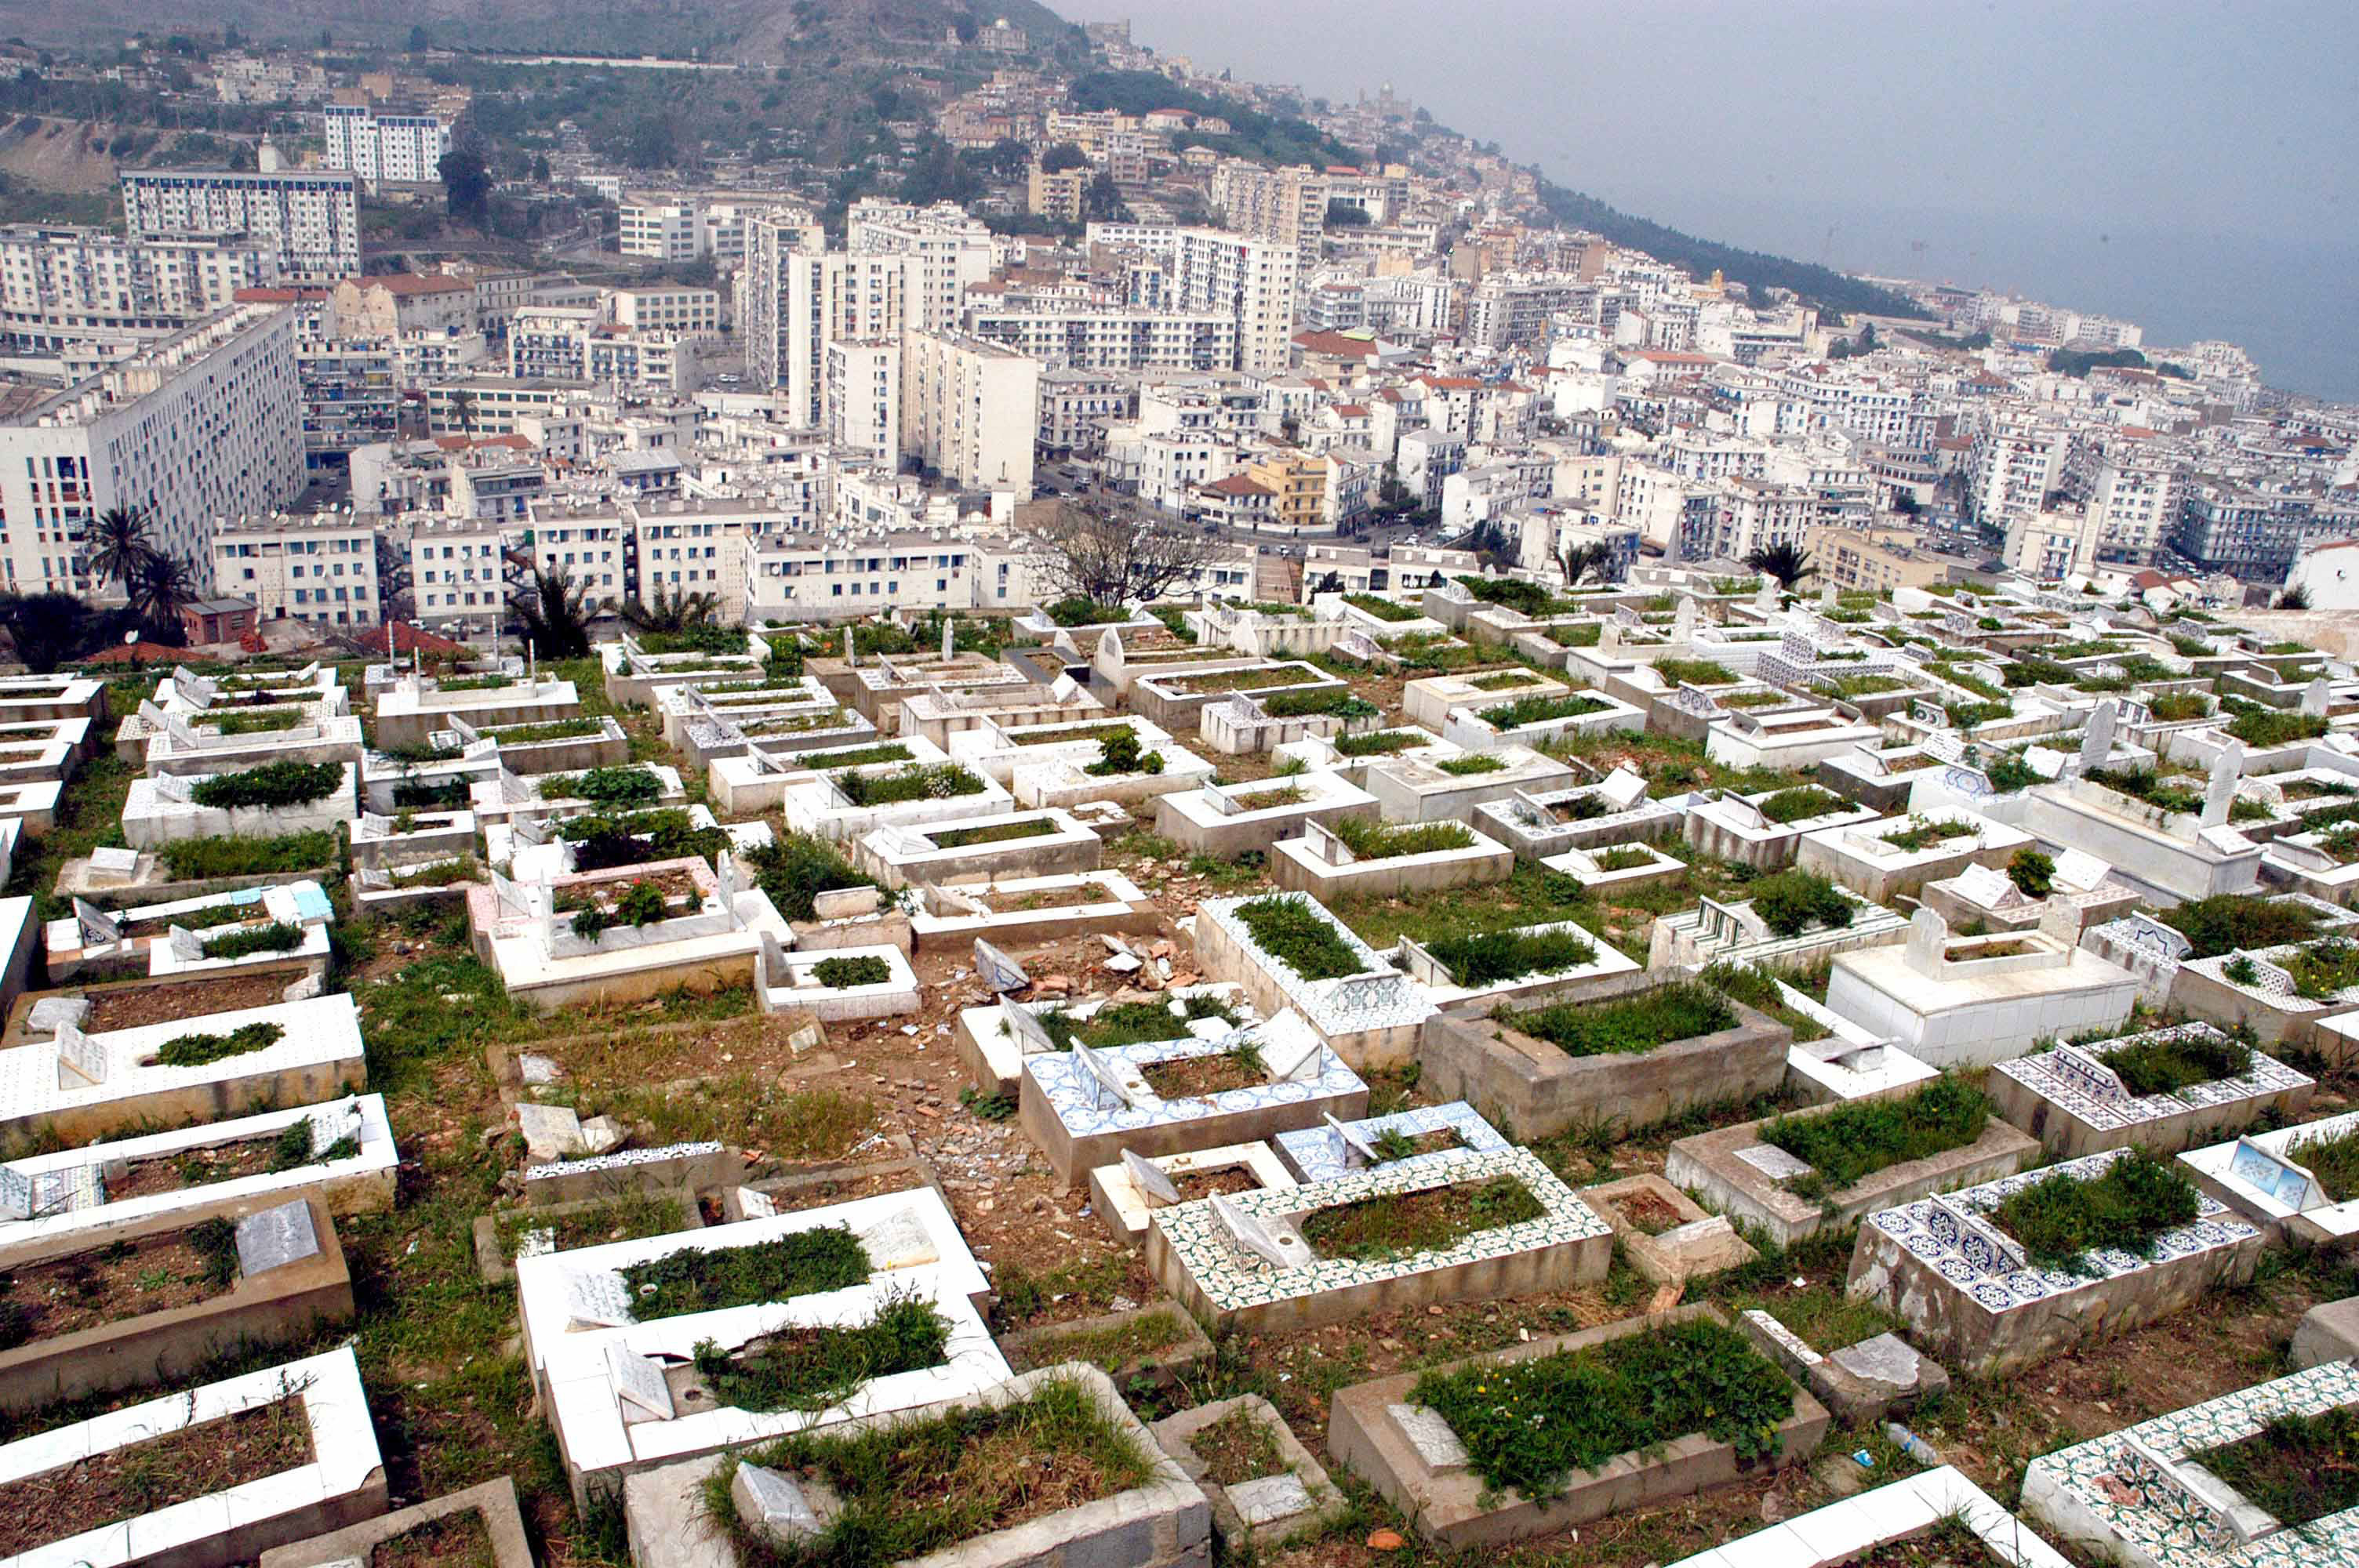 مقابر الجزائر تضيق بموتاها